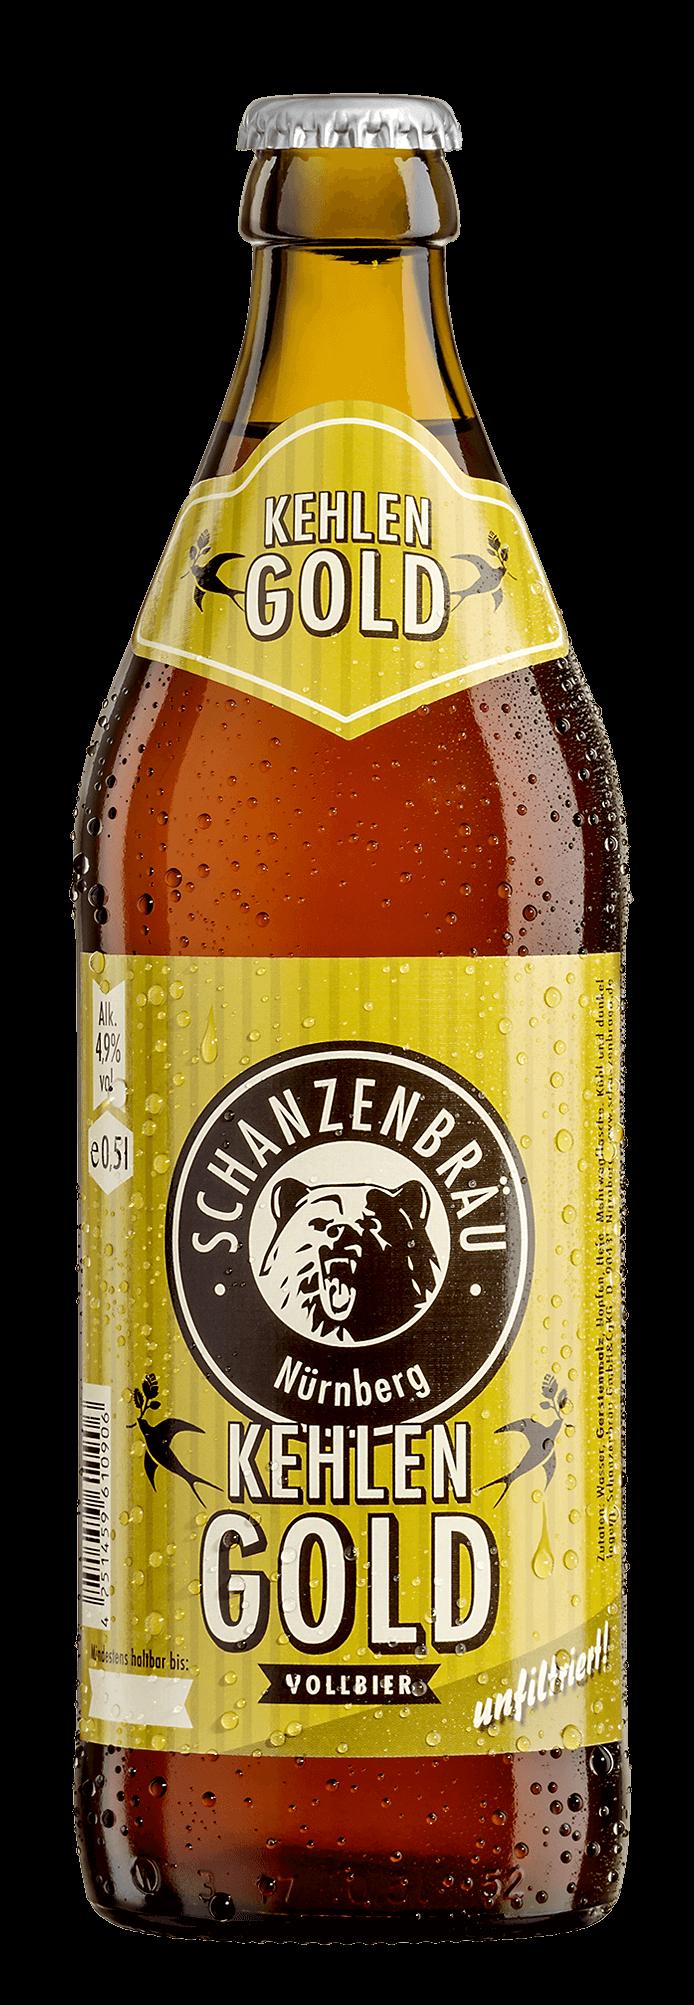 Kehlengold Brauerei Schanzenbräu IPA